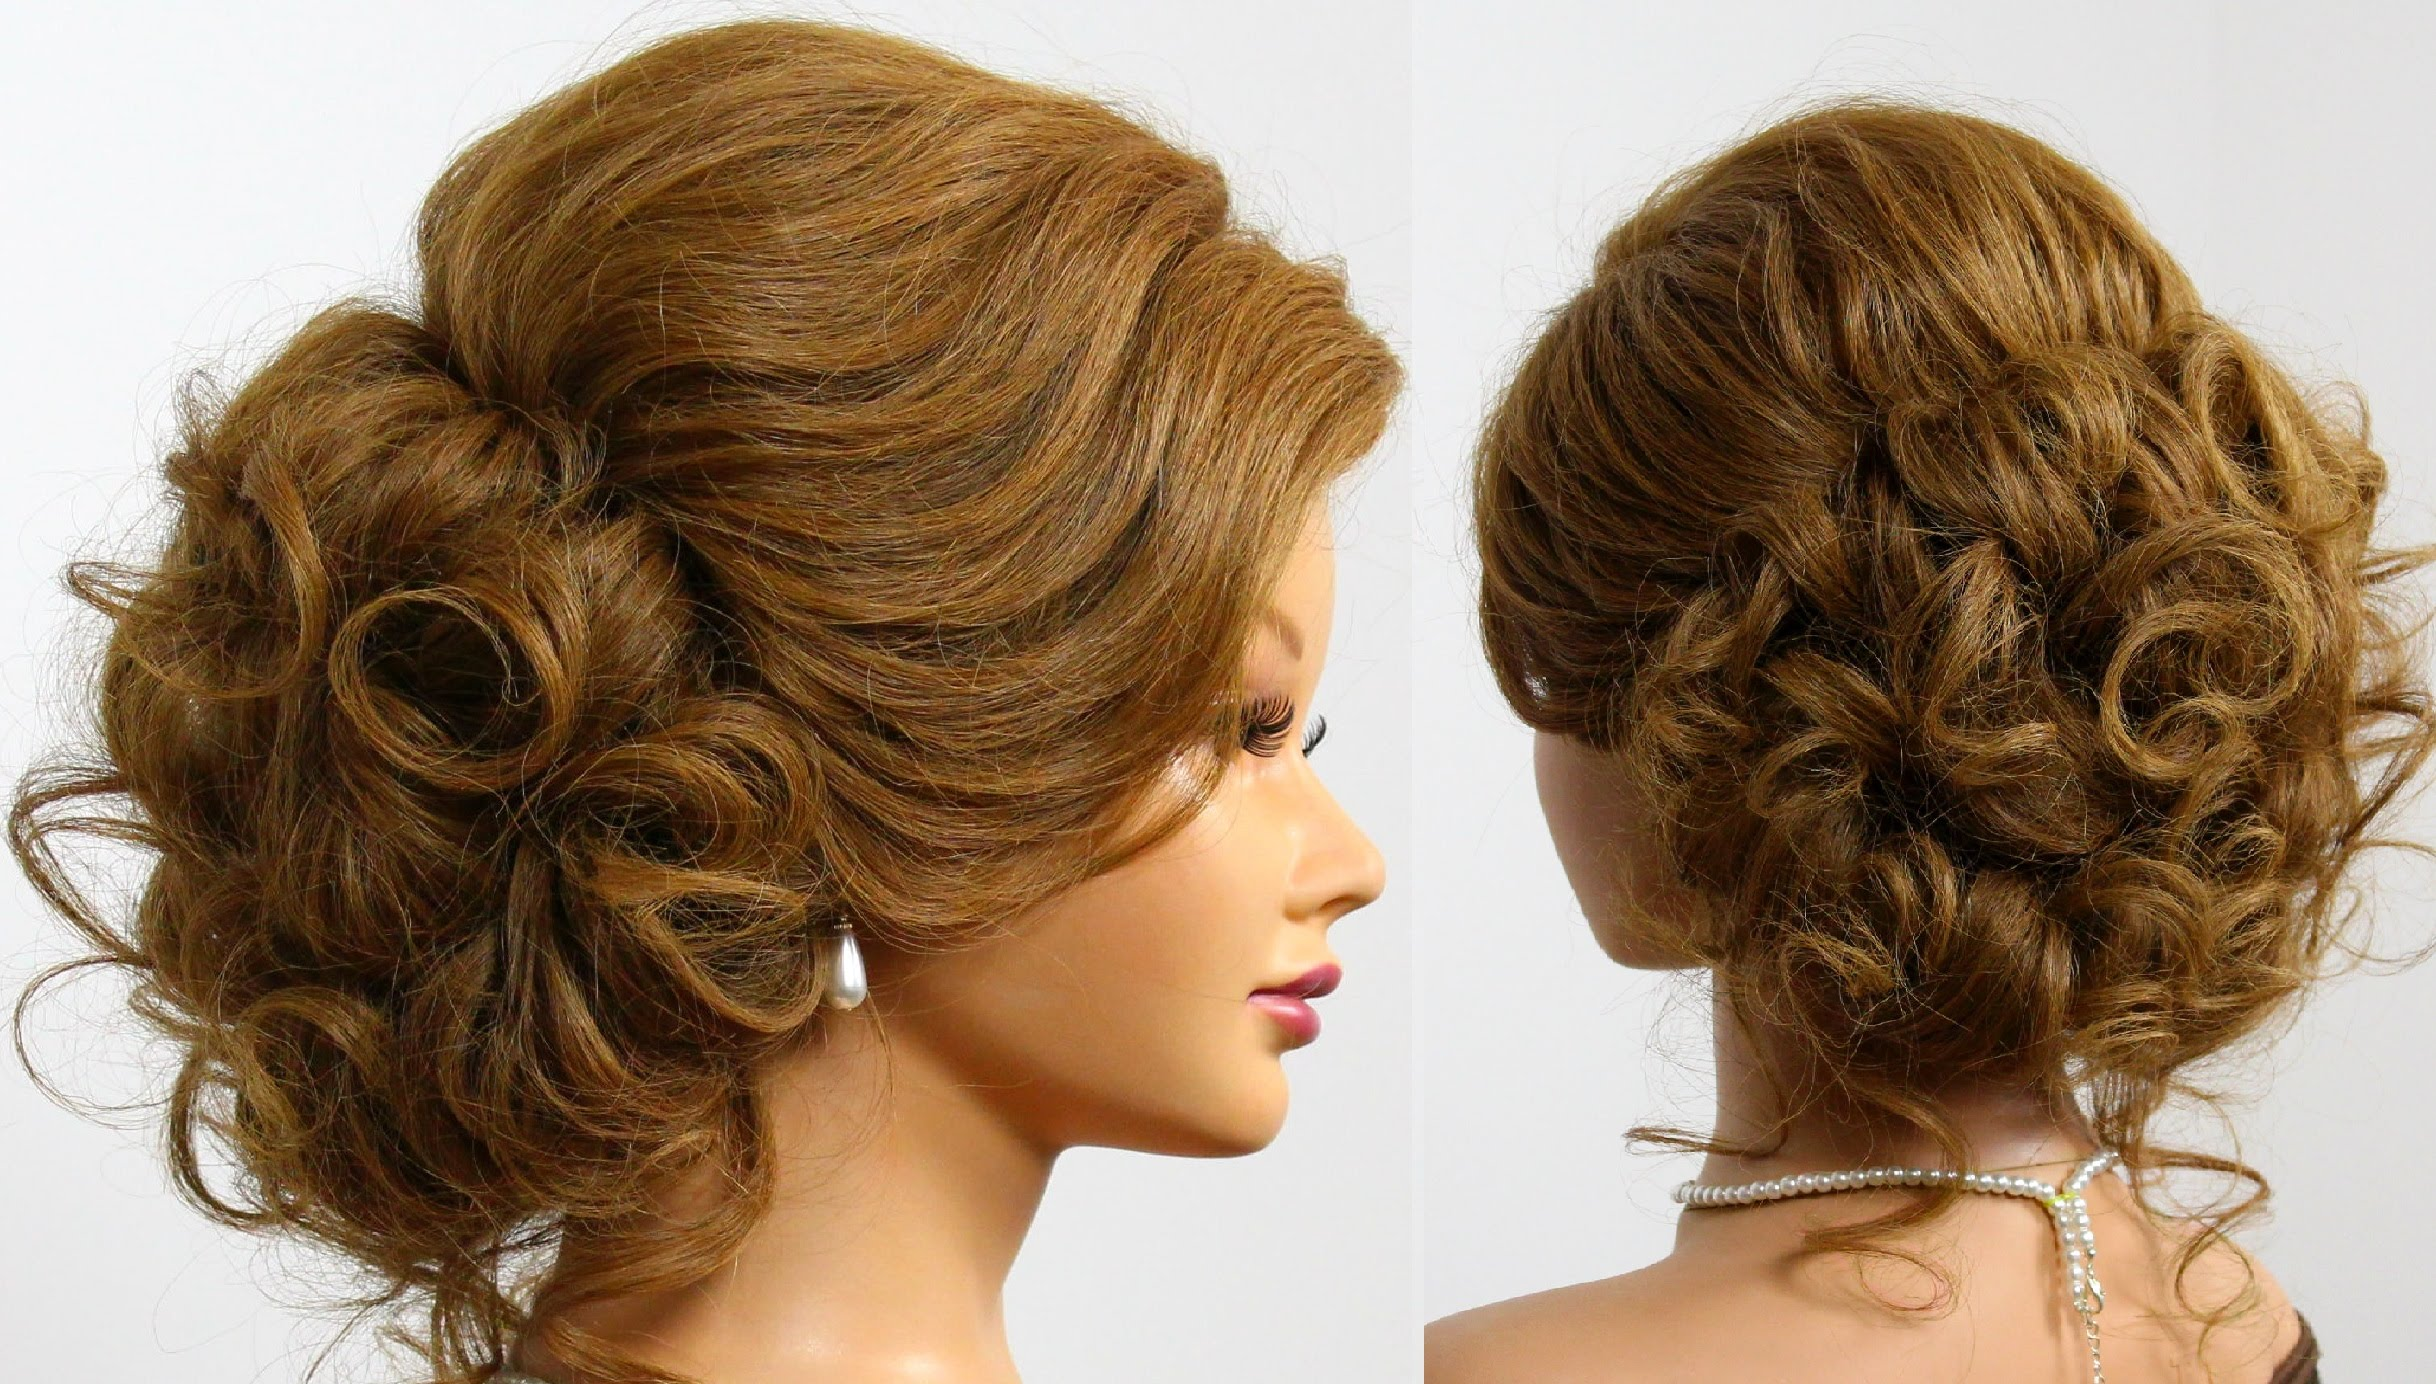 35 Beautiful Wedding Hairstyles For Long Hair: 21 مدل موی بسته شیک زنانه و دخترانه 2018 برای درخشش در هر